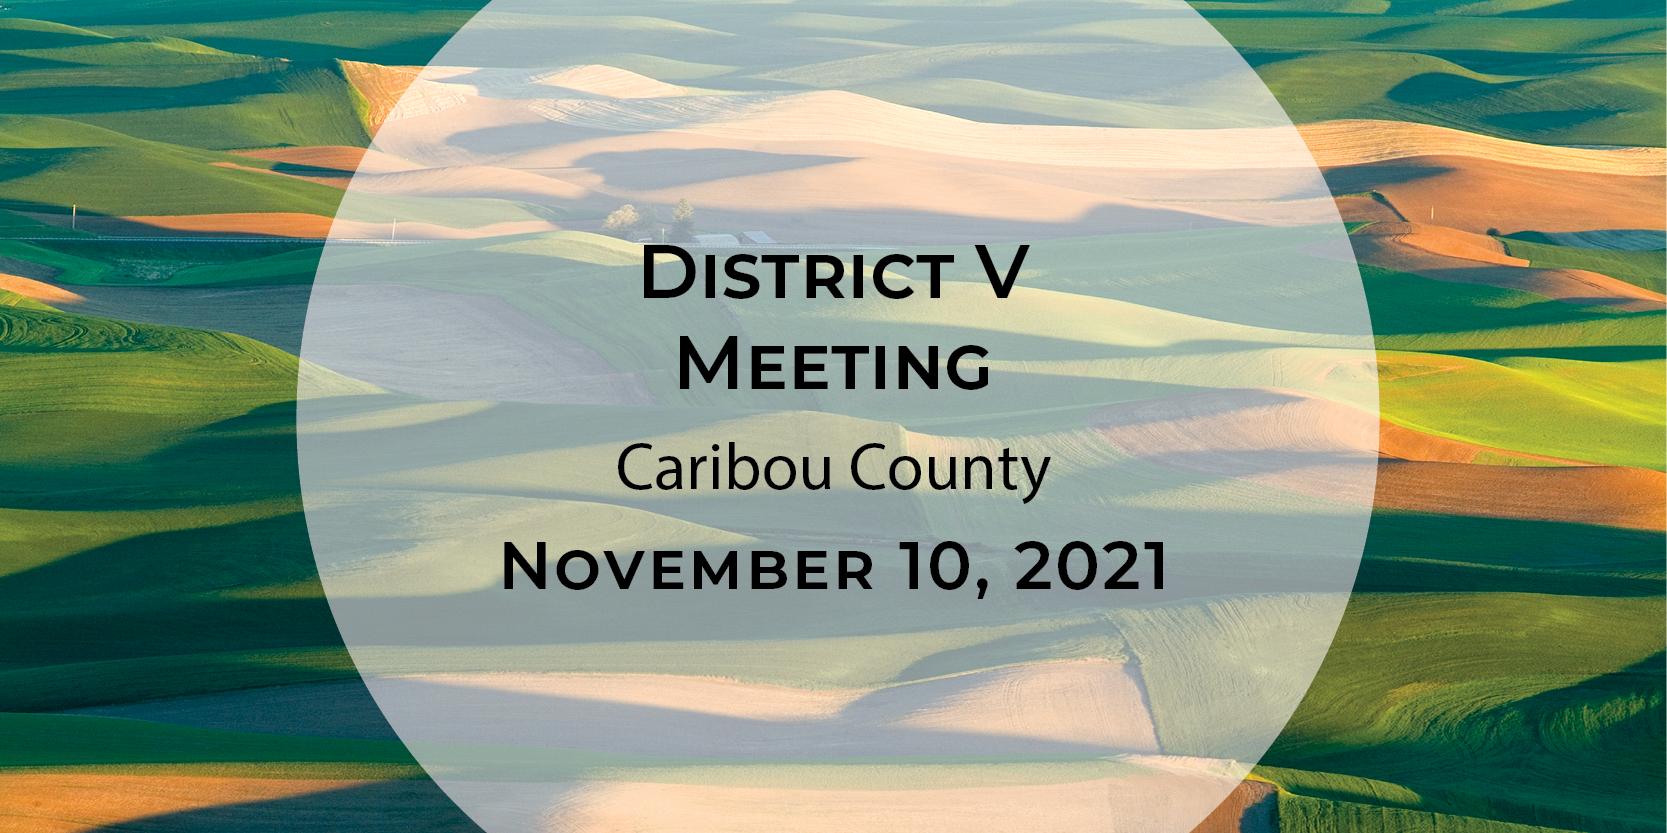 District V Meeting